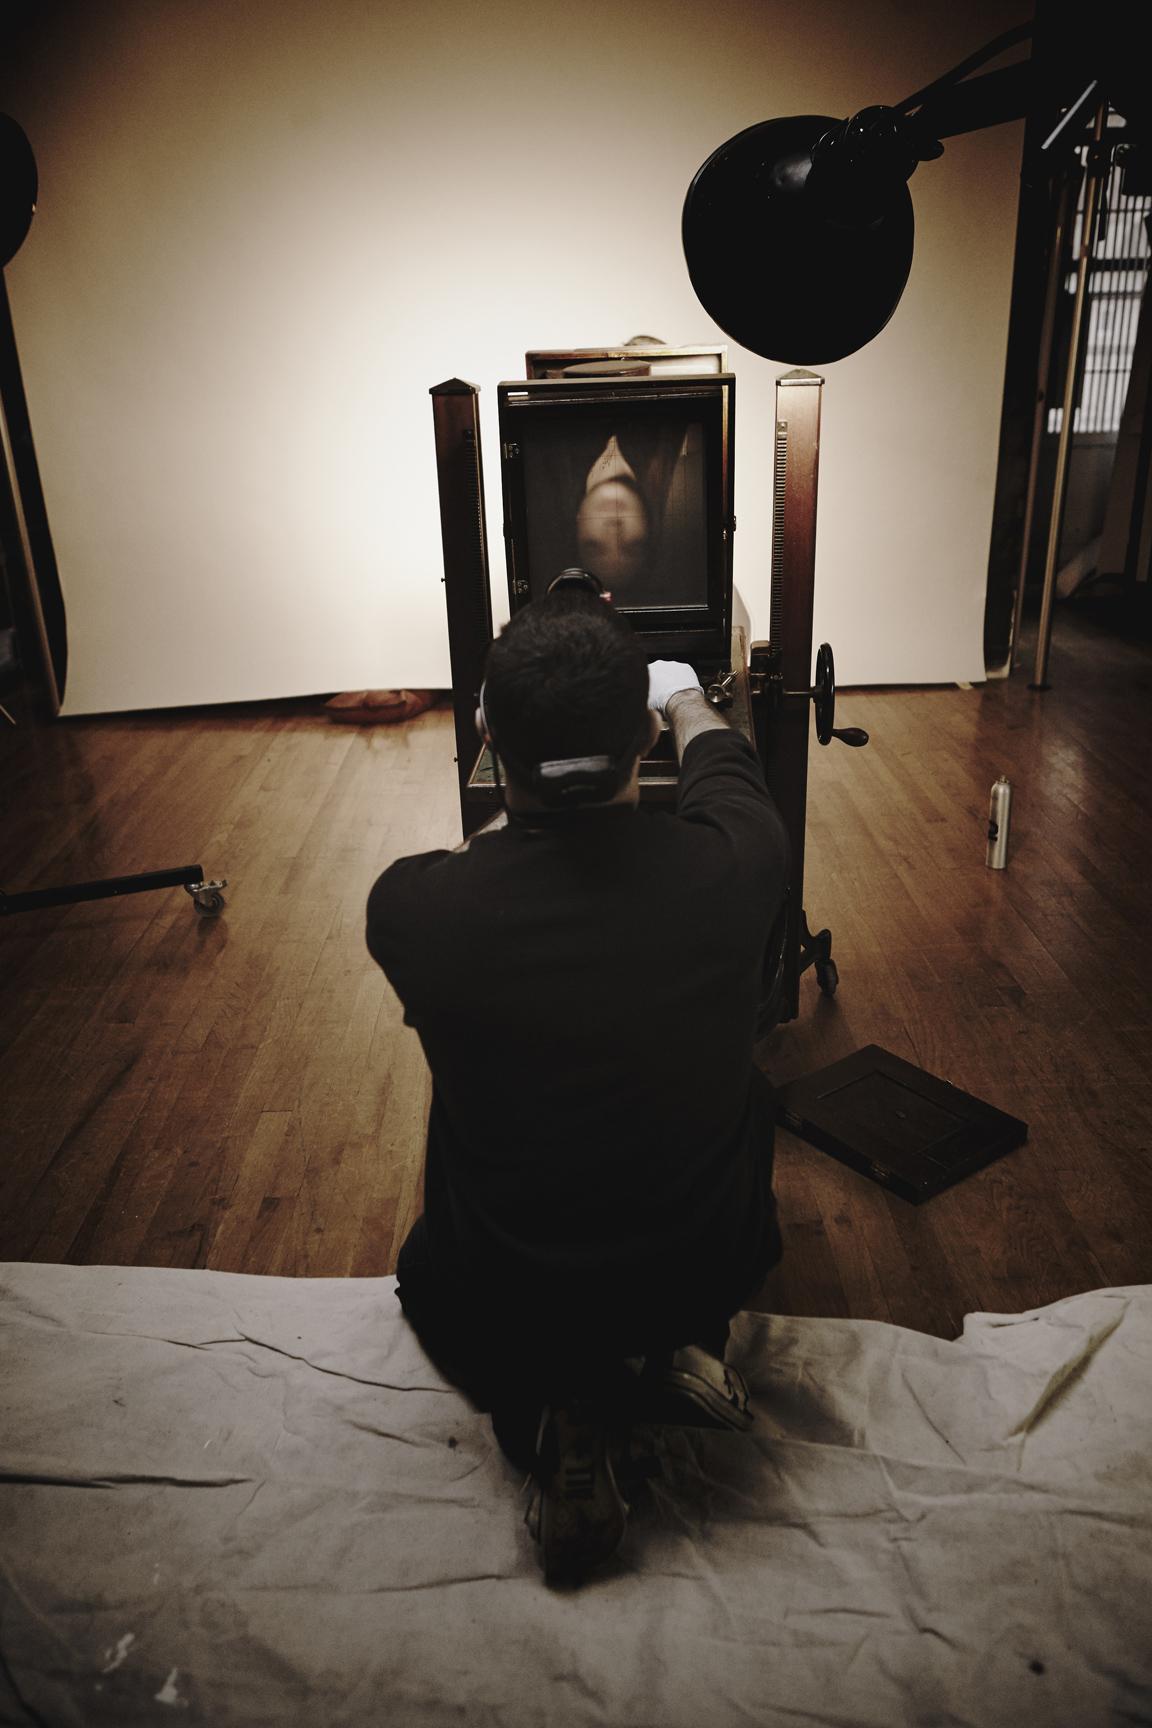 JAMES-WEBER-PHOTOGRAPHER-wetplate-collodion-13498.jpg